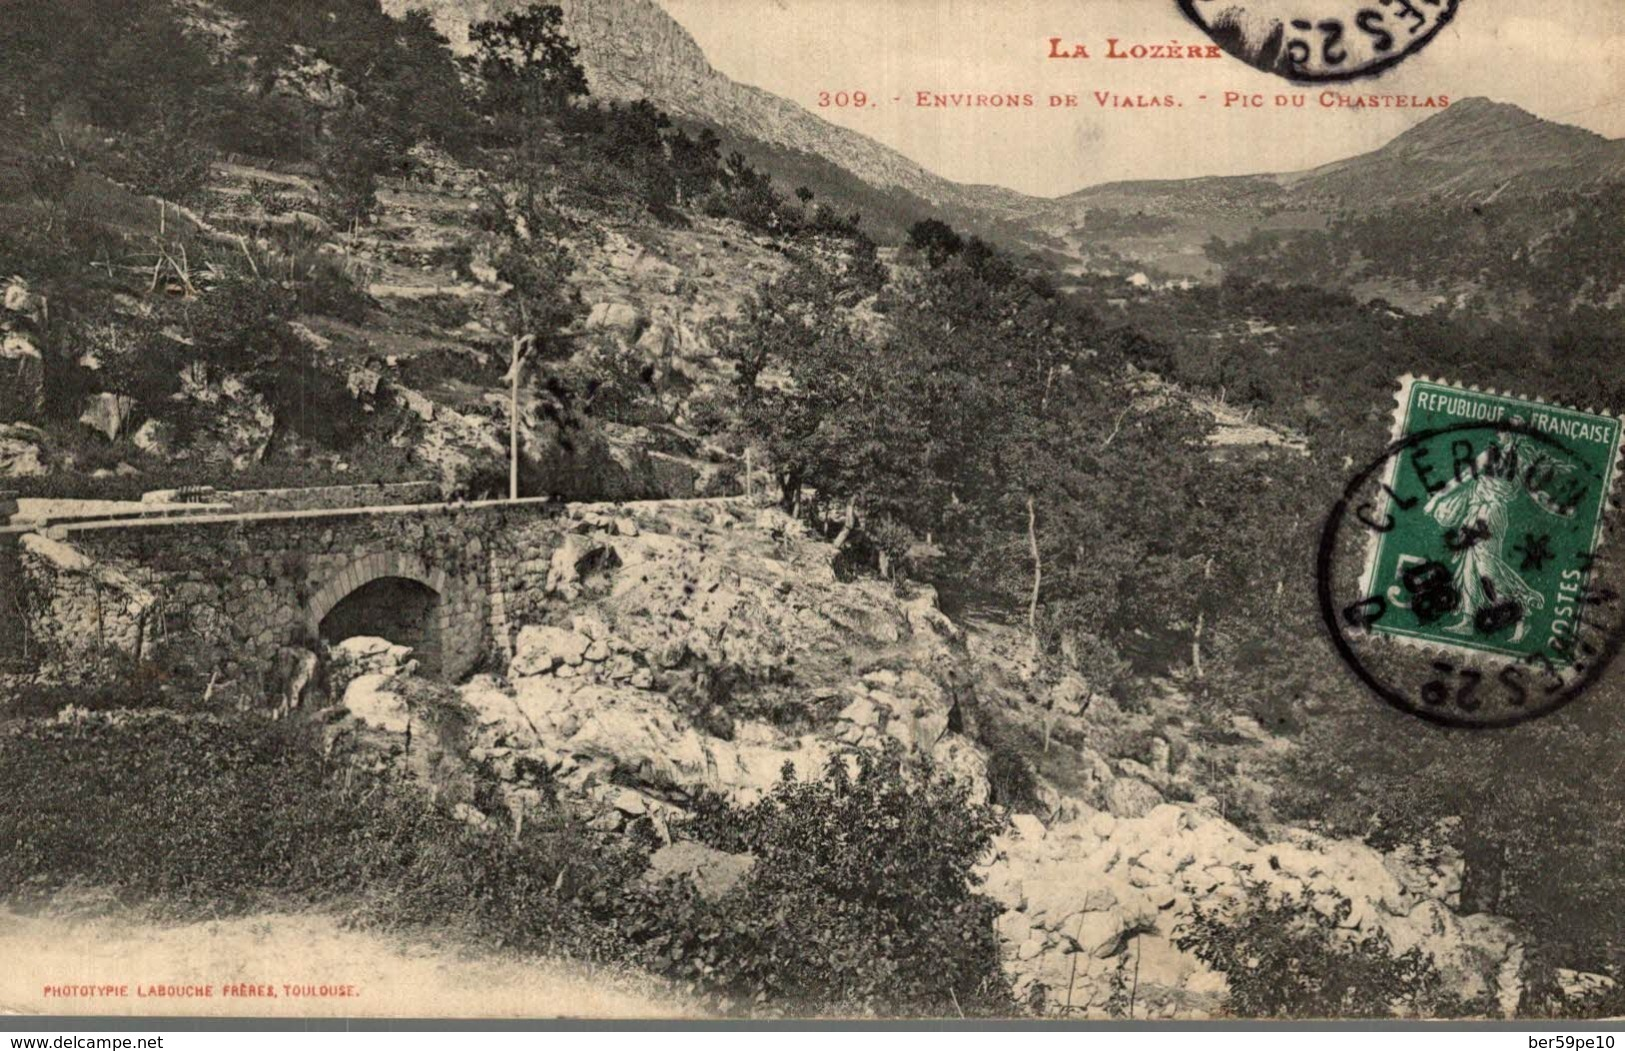 48 ENVIRONS DE VIALAS  PIC DE CHASTELAS - France